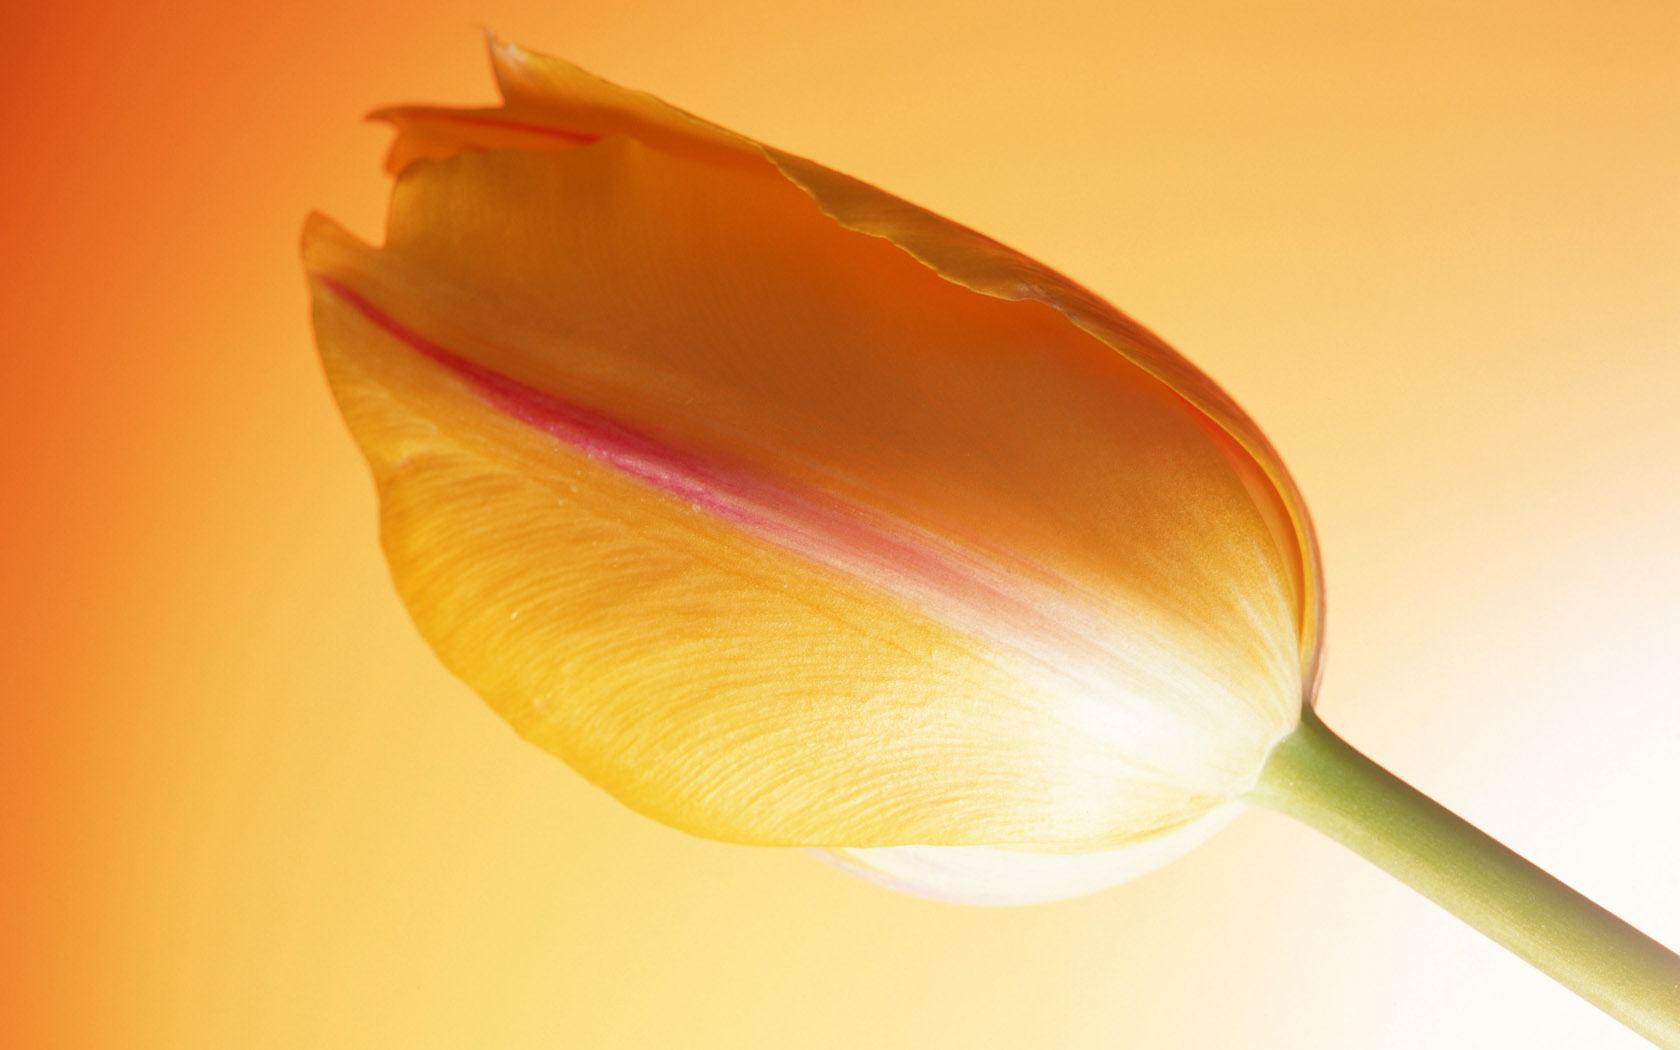 Скачать обои жёлтый тюльпан на жёлтом